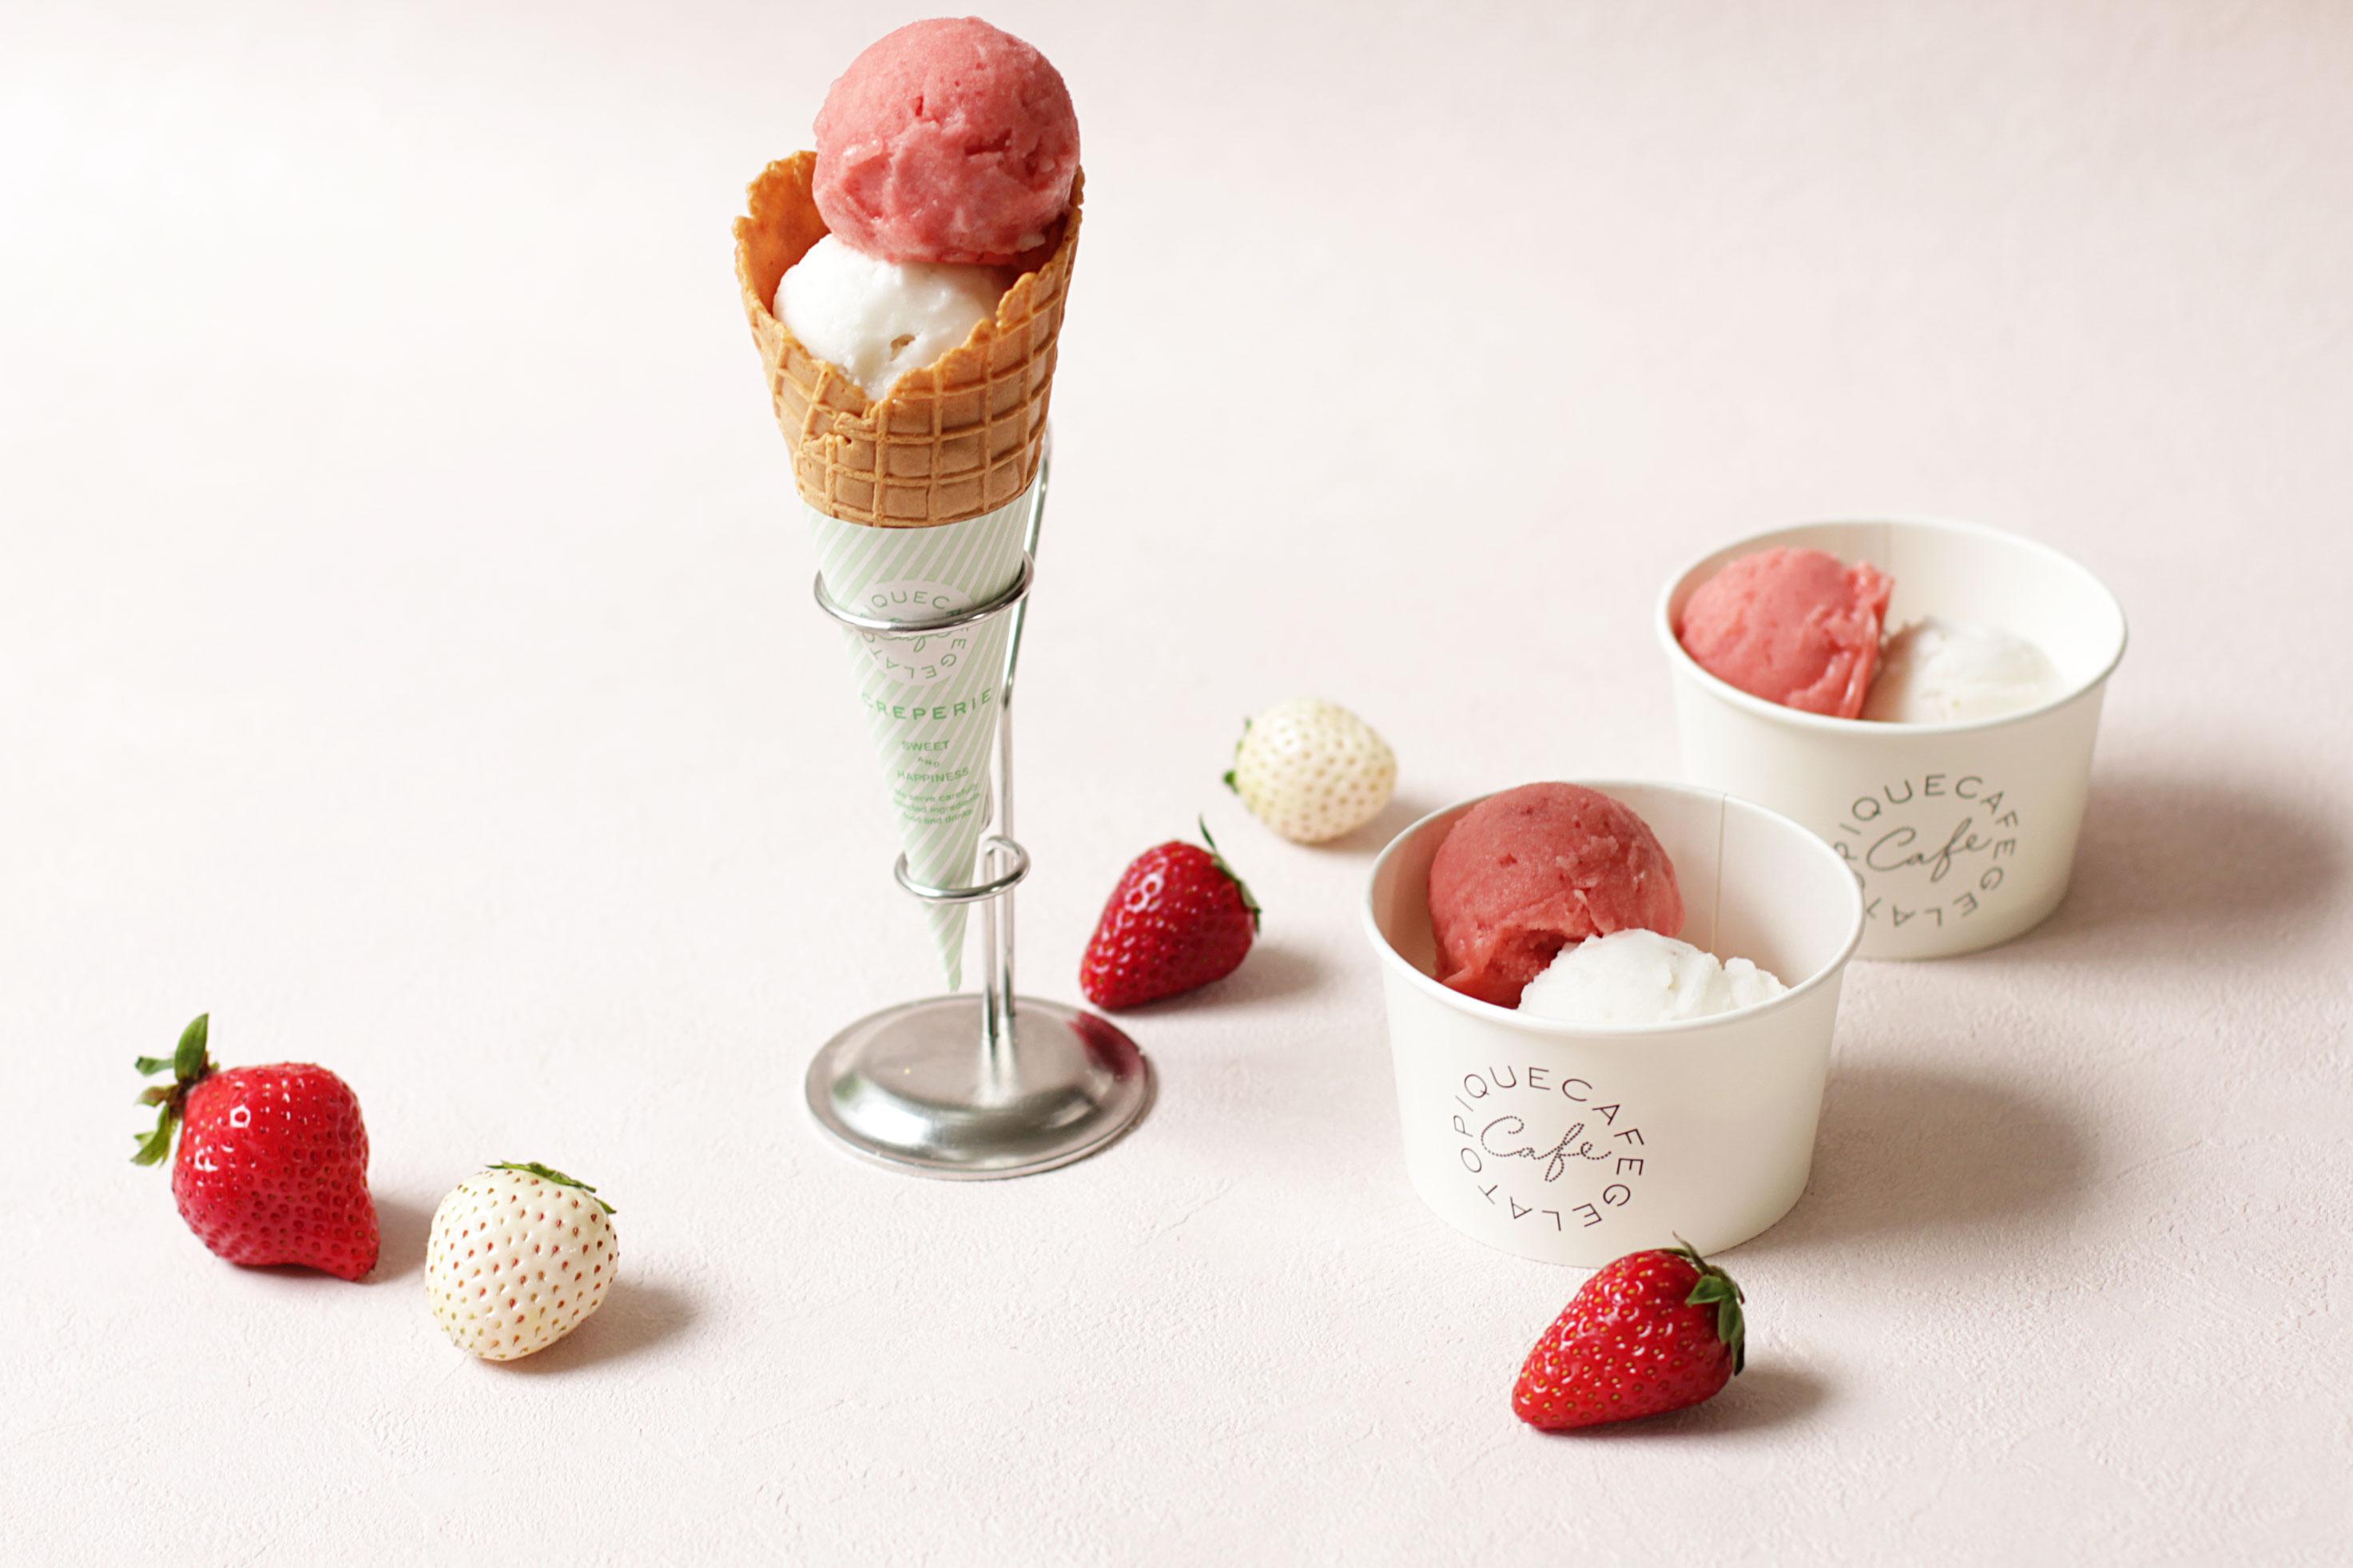 gelato pique cafe いちごフェア Strawberry Fair 咖啡店草莓節_2